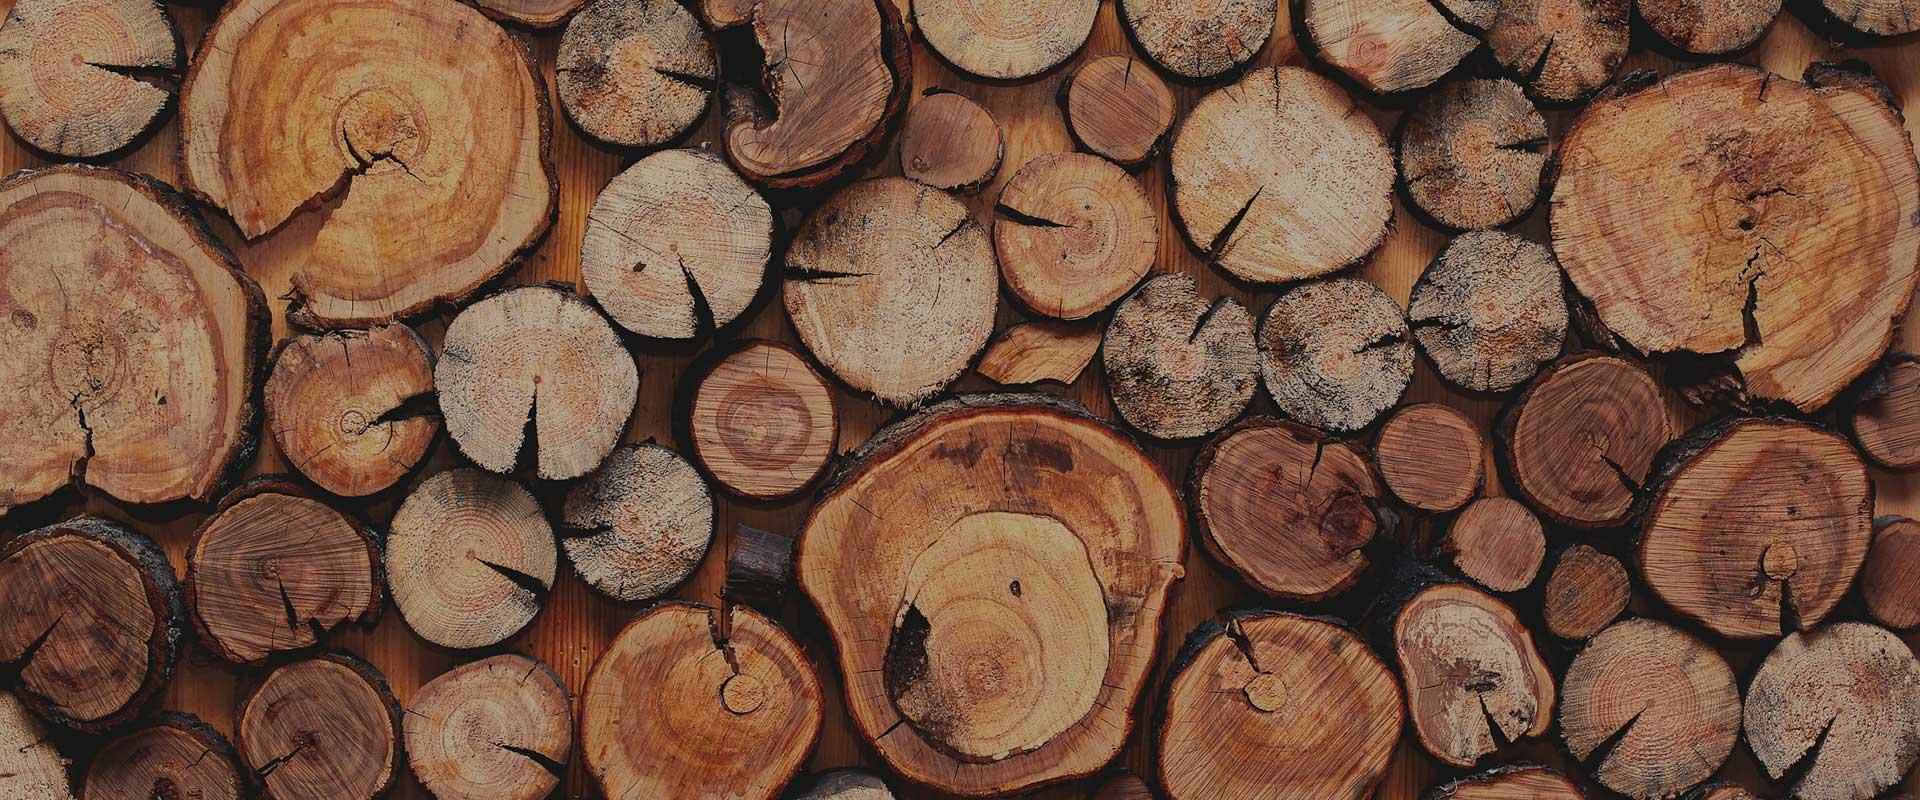 Lumber Store, Cypress Wood: Port Barre, LA: The Cypress Depot